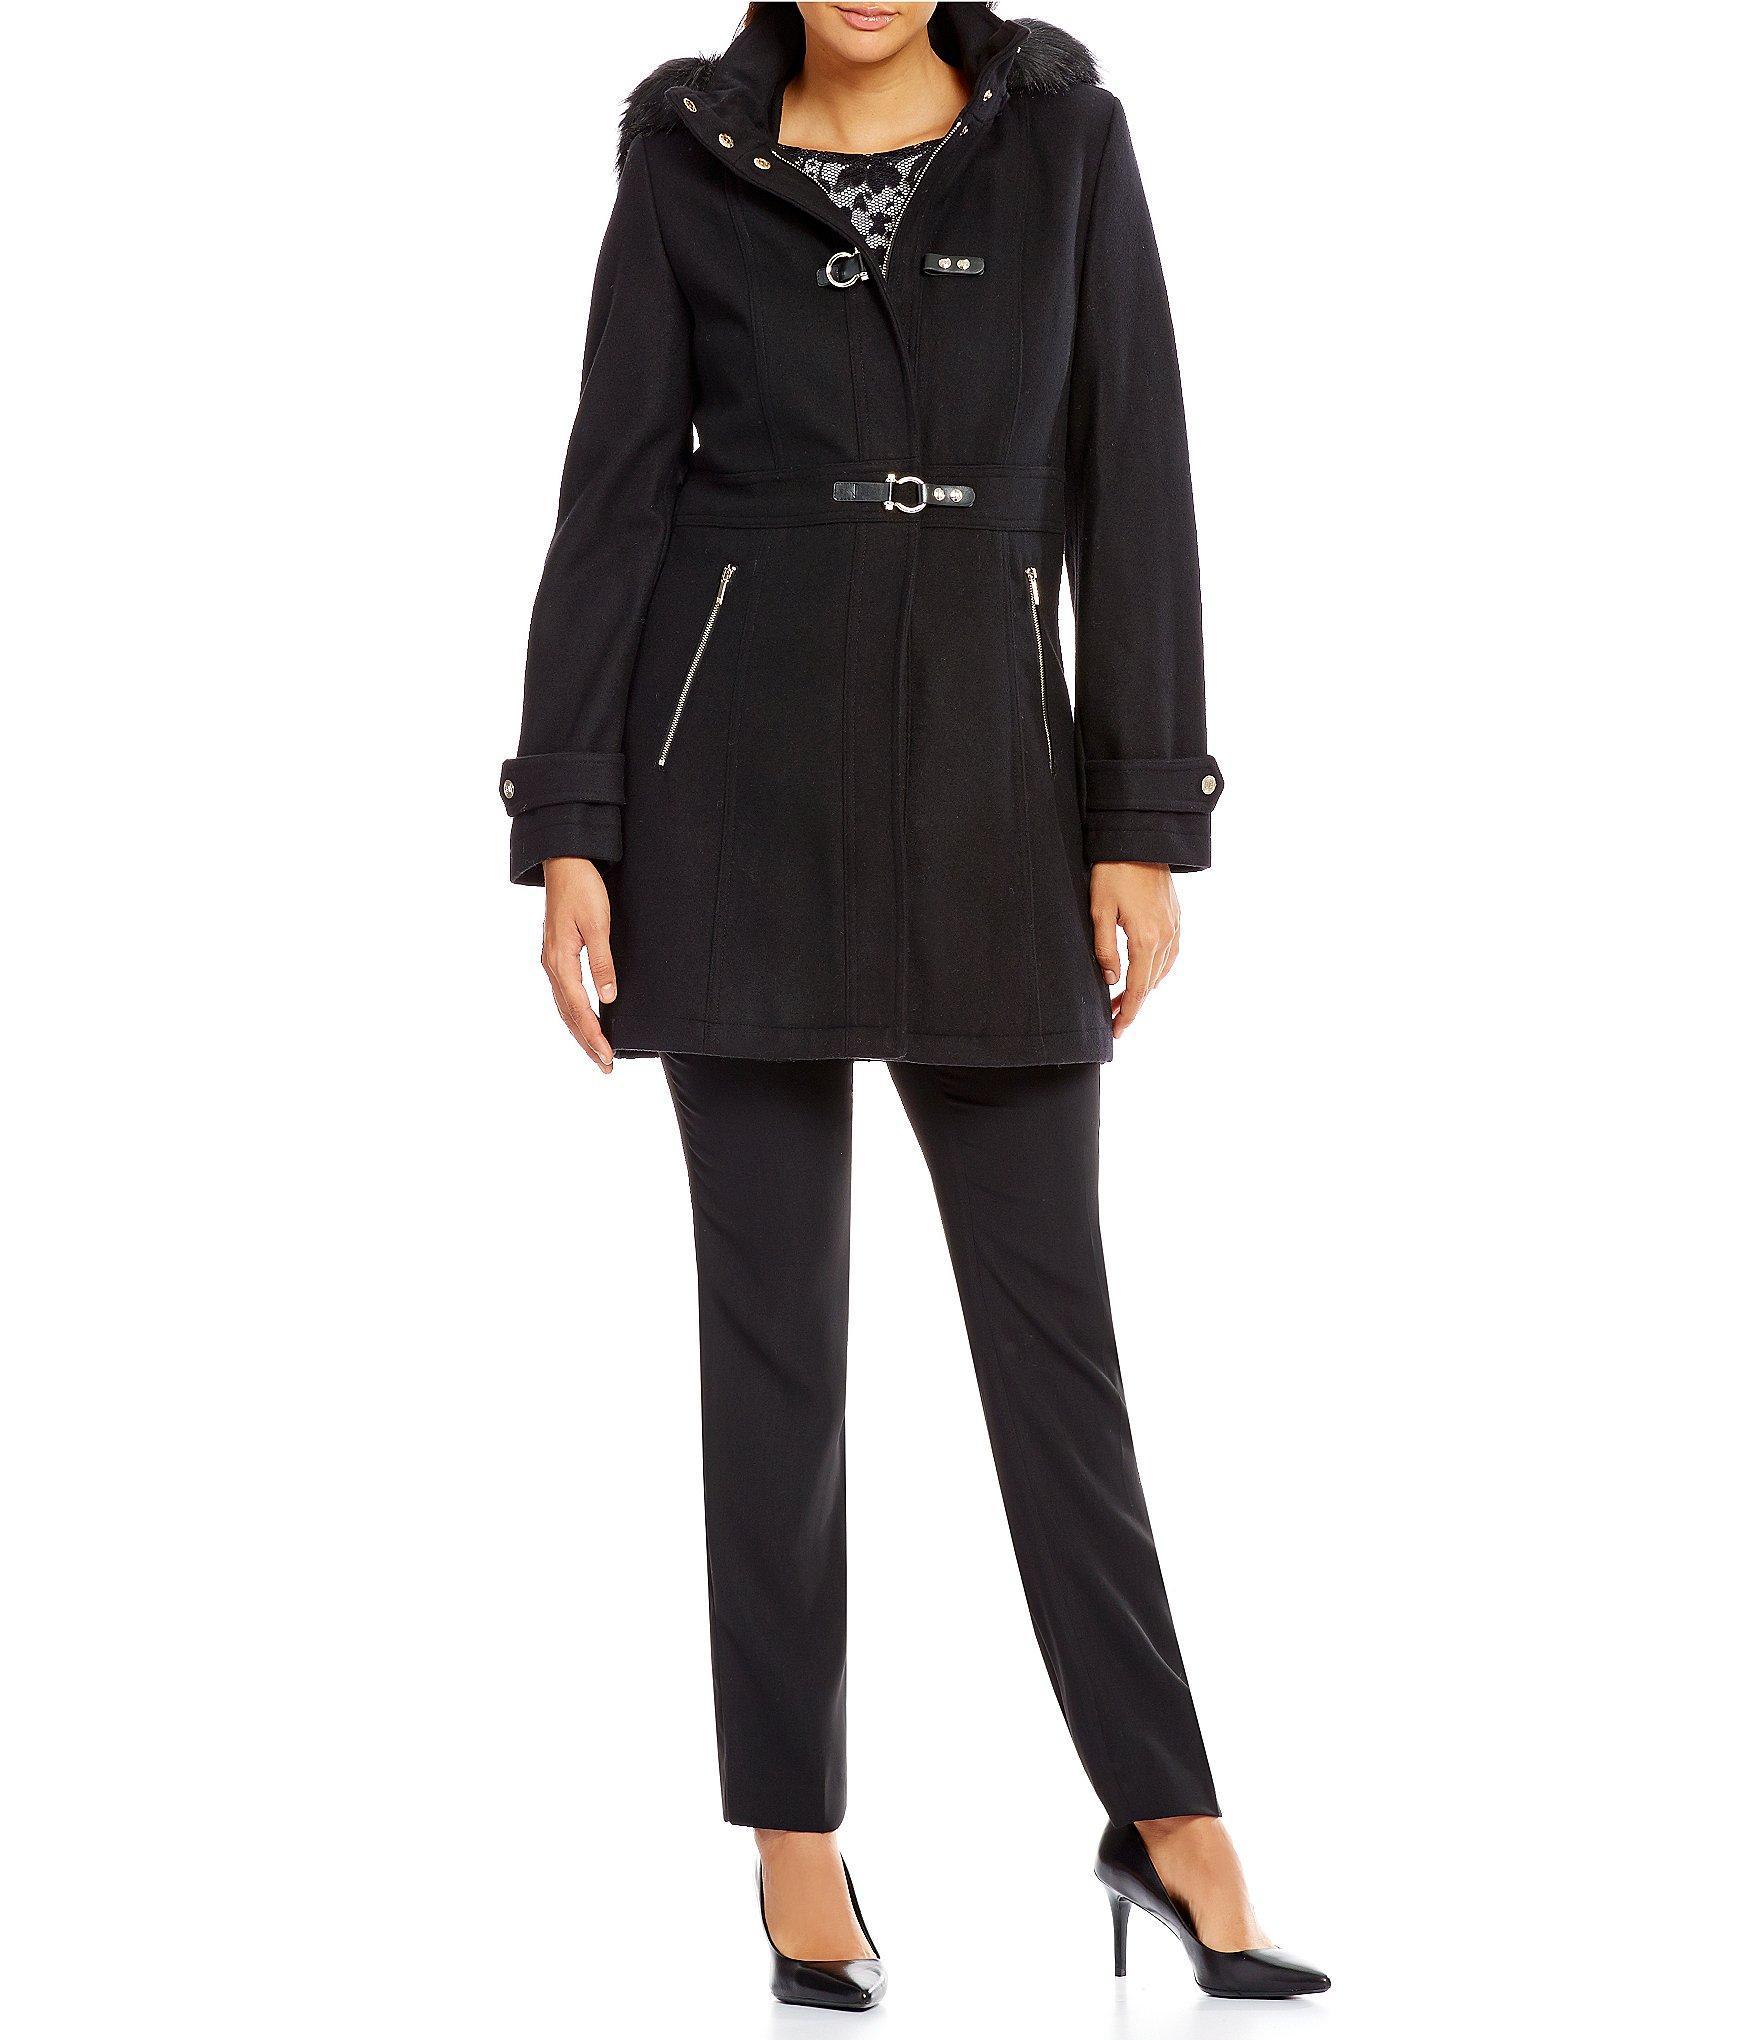 Ivanka trump Wool Walker With Detachable Faux Fur Hood in Black | Lyst